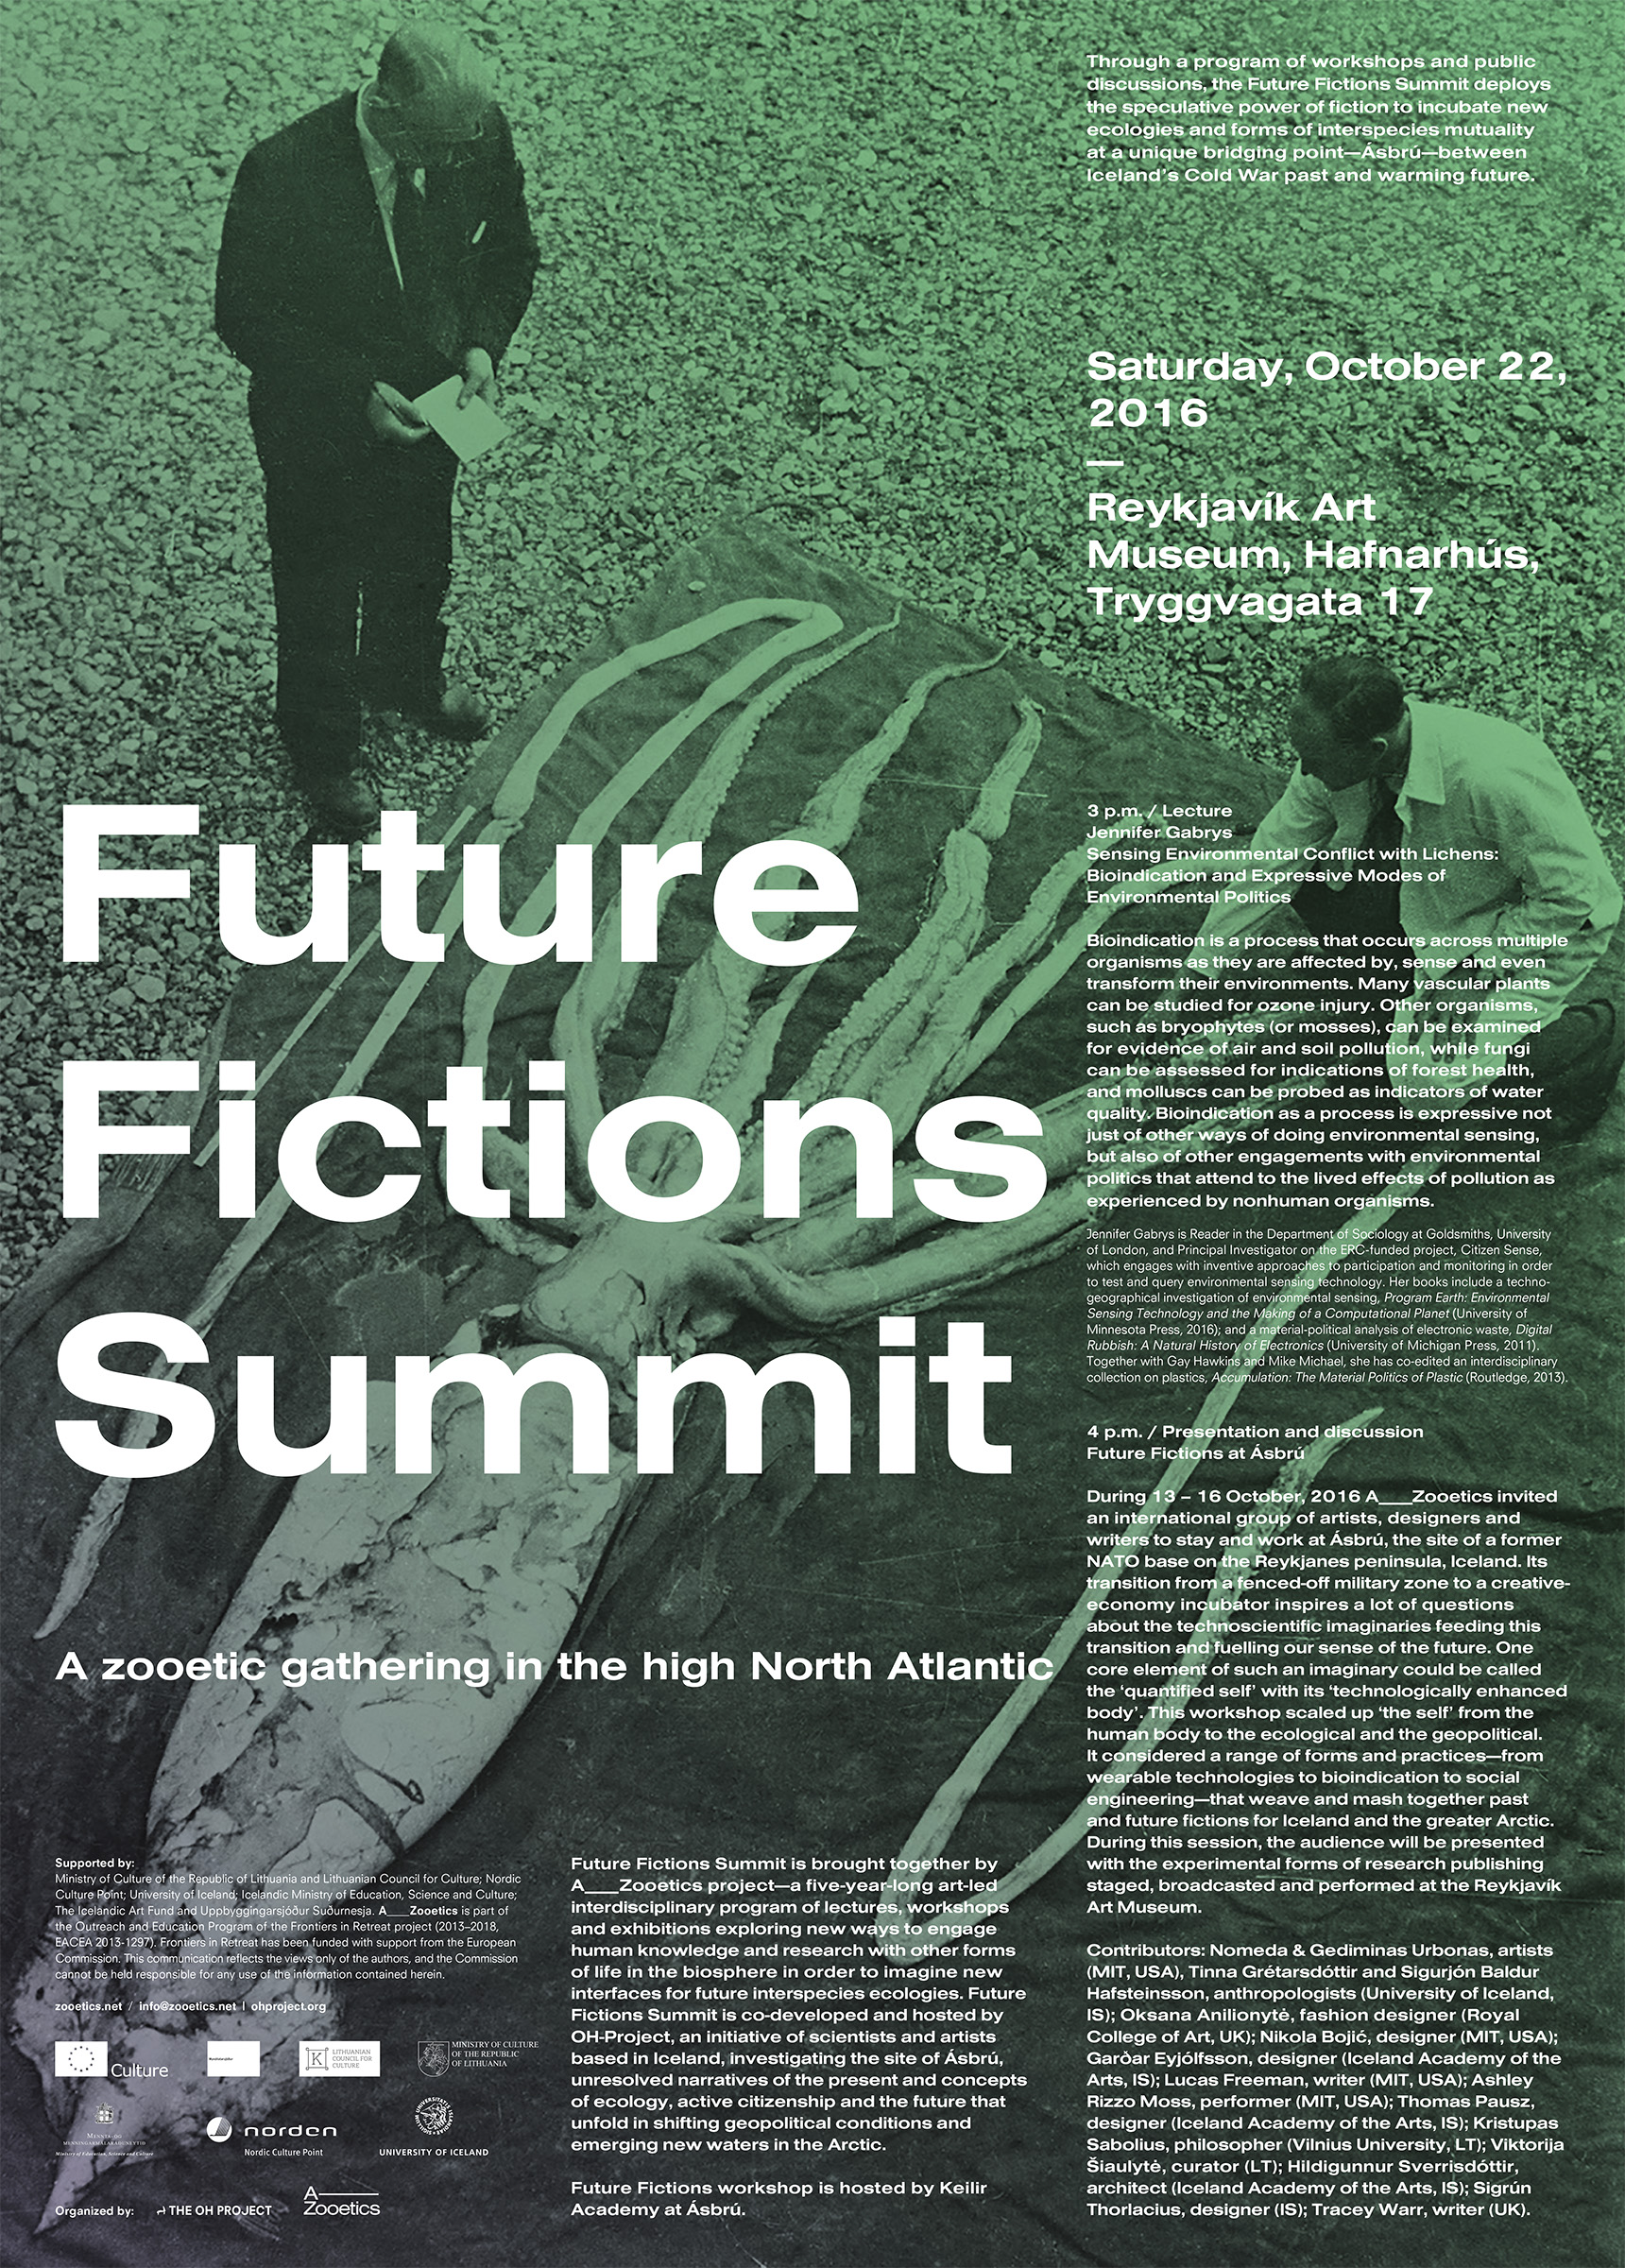 Zooetics — Future Fictions Summit in Iceland